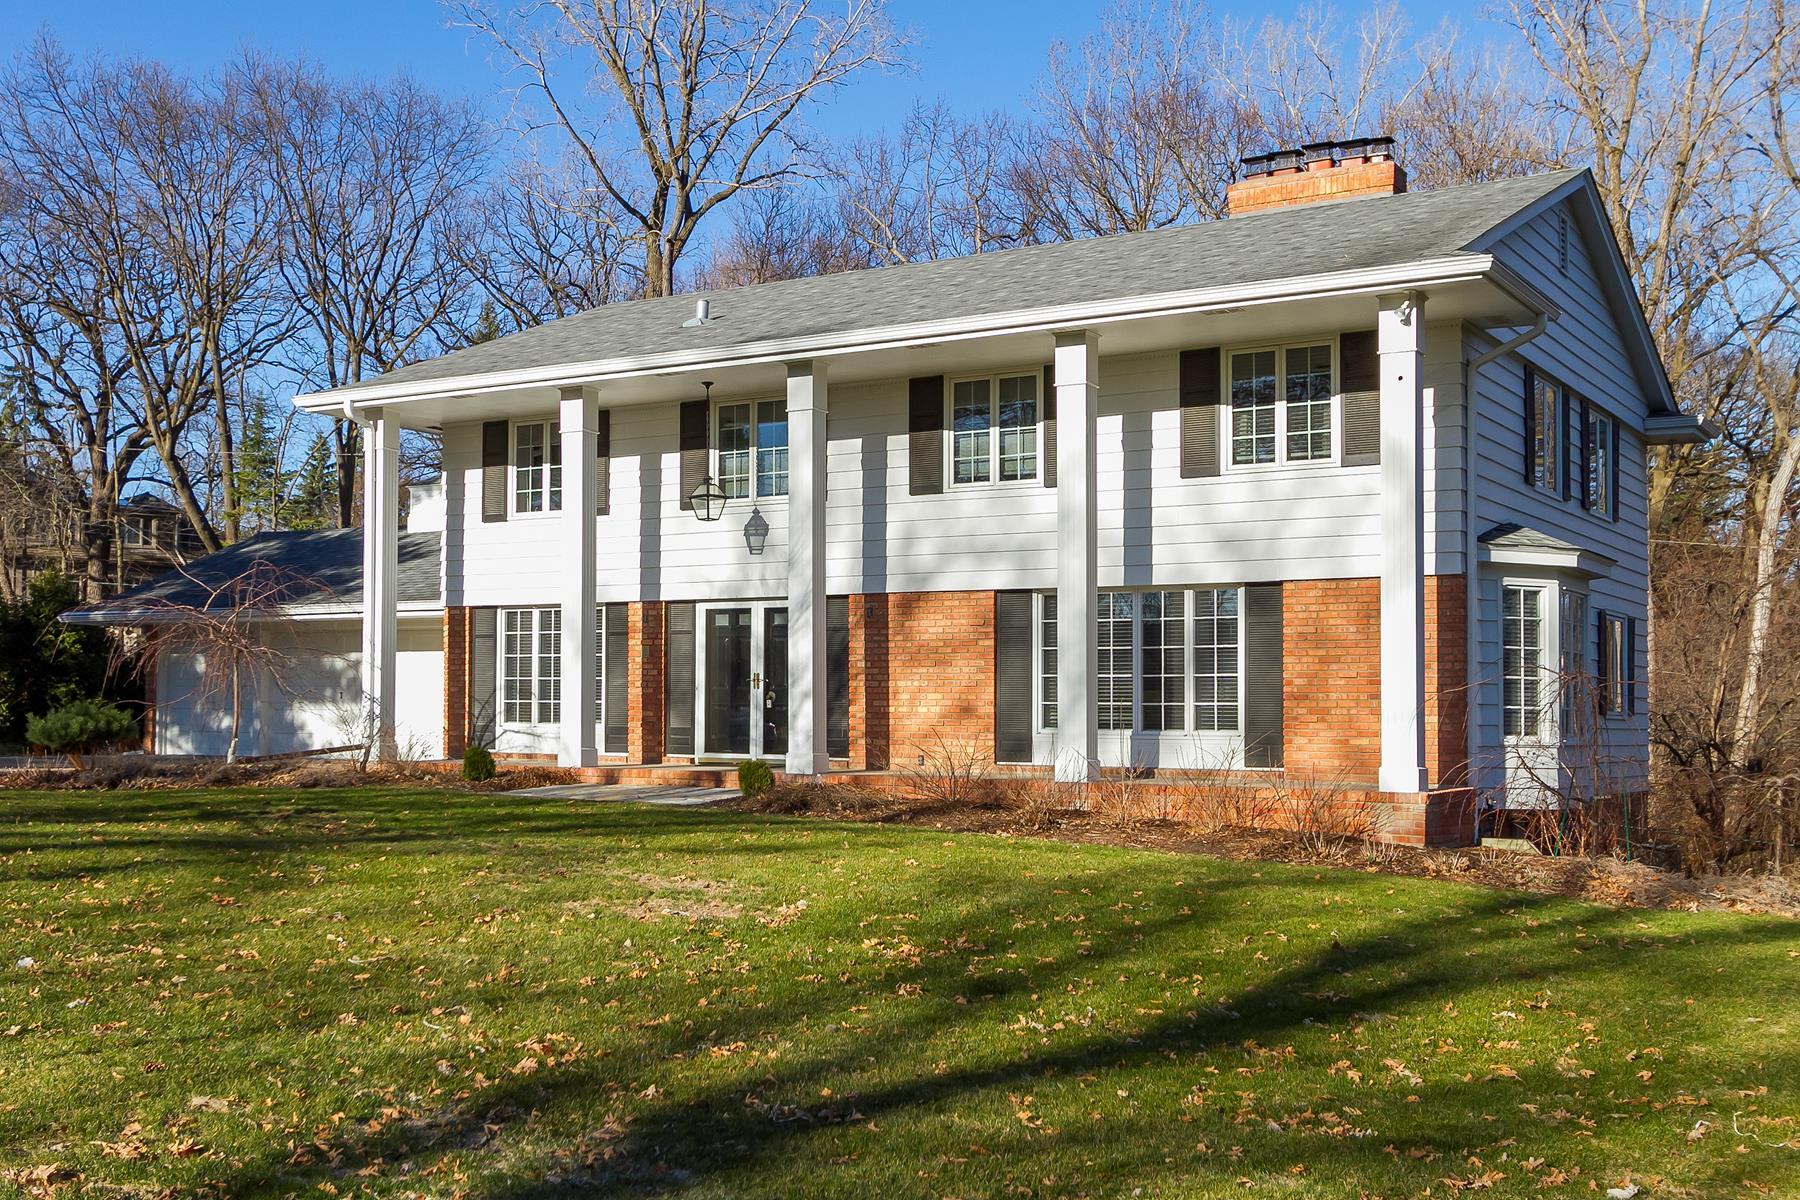 Single Family Home for Sale at 5705 Schaefer Road Edina, Minnesota, 55436 United States